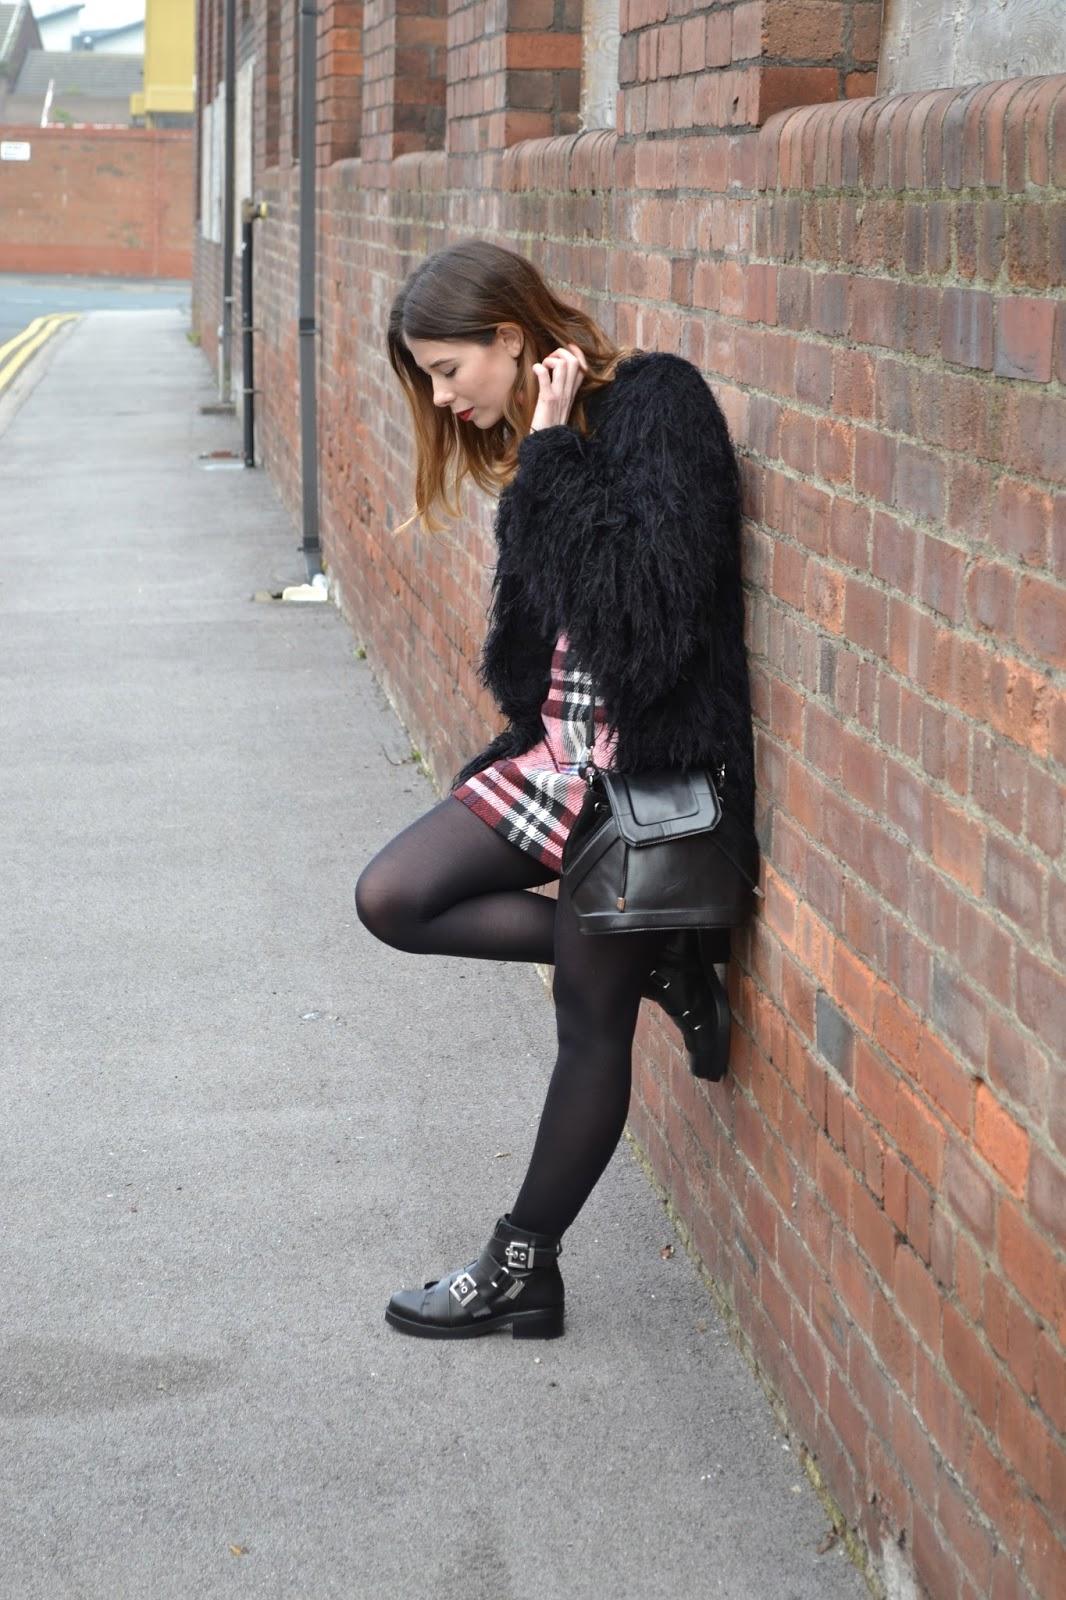 womens affordable highstreet fashion blog featuring British street style. Black polo neck. Topshop tartan skirt. Leather black buckle boots from Kurt Geiger. Black shabby jacket. Hollies closet